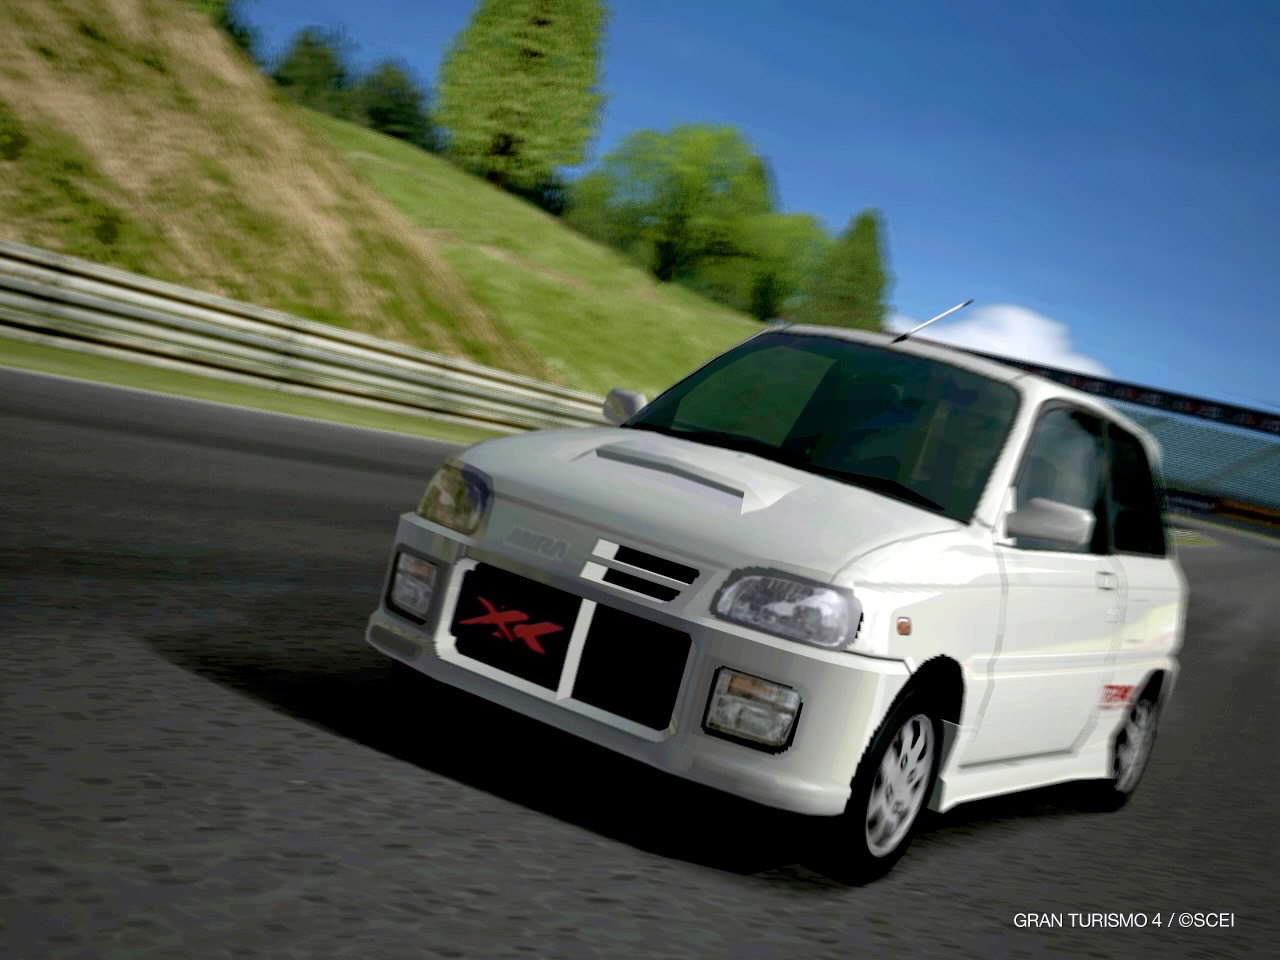 Разборка Daihatsu, Б/У запчасти на Дайхатсу ᐉ Авторазборка